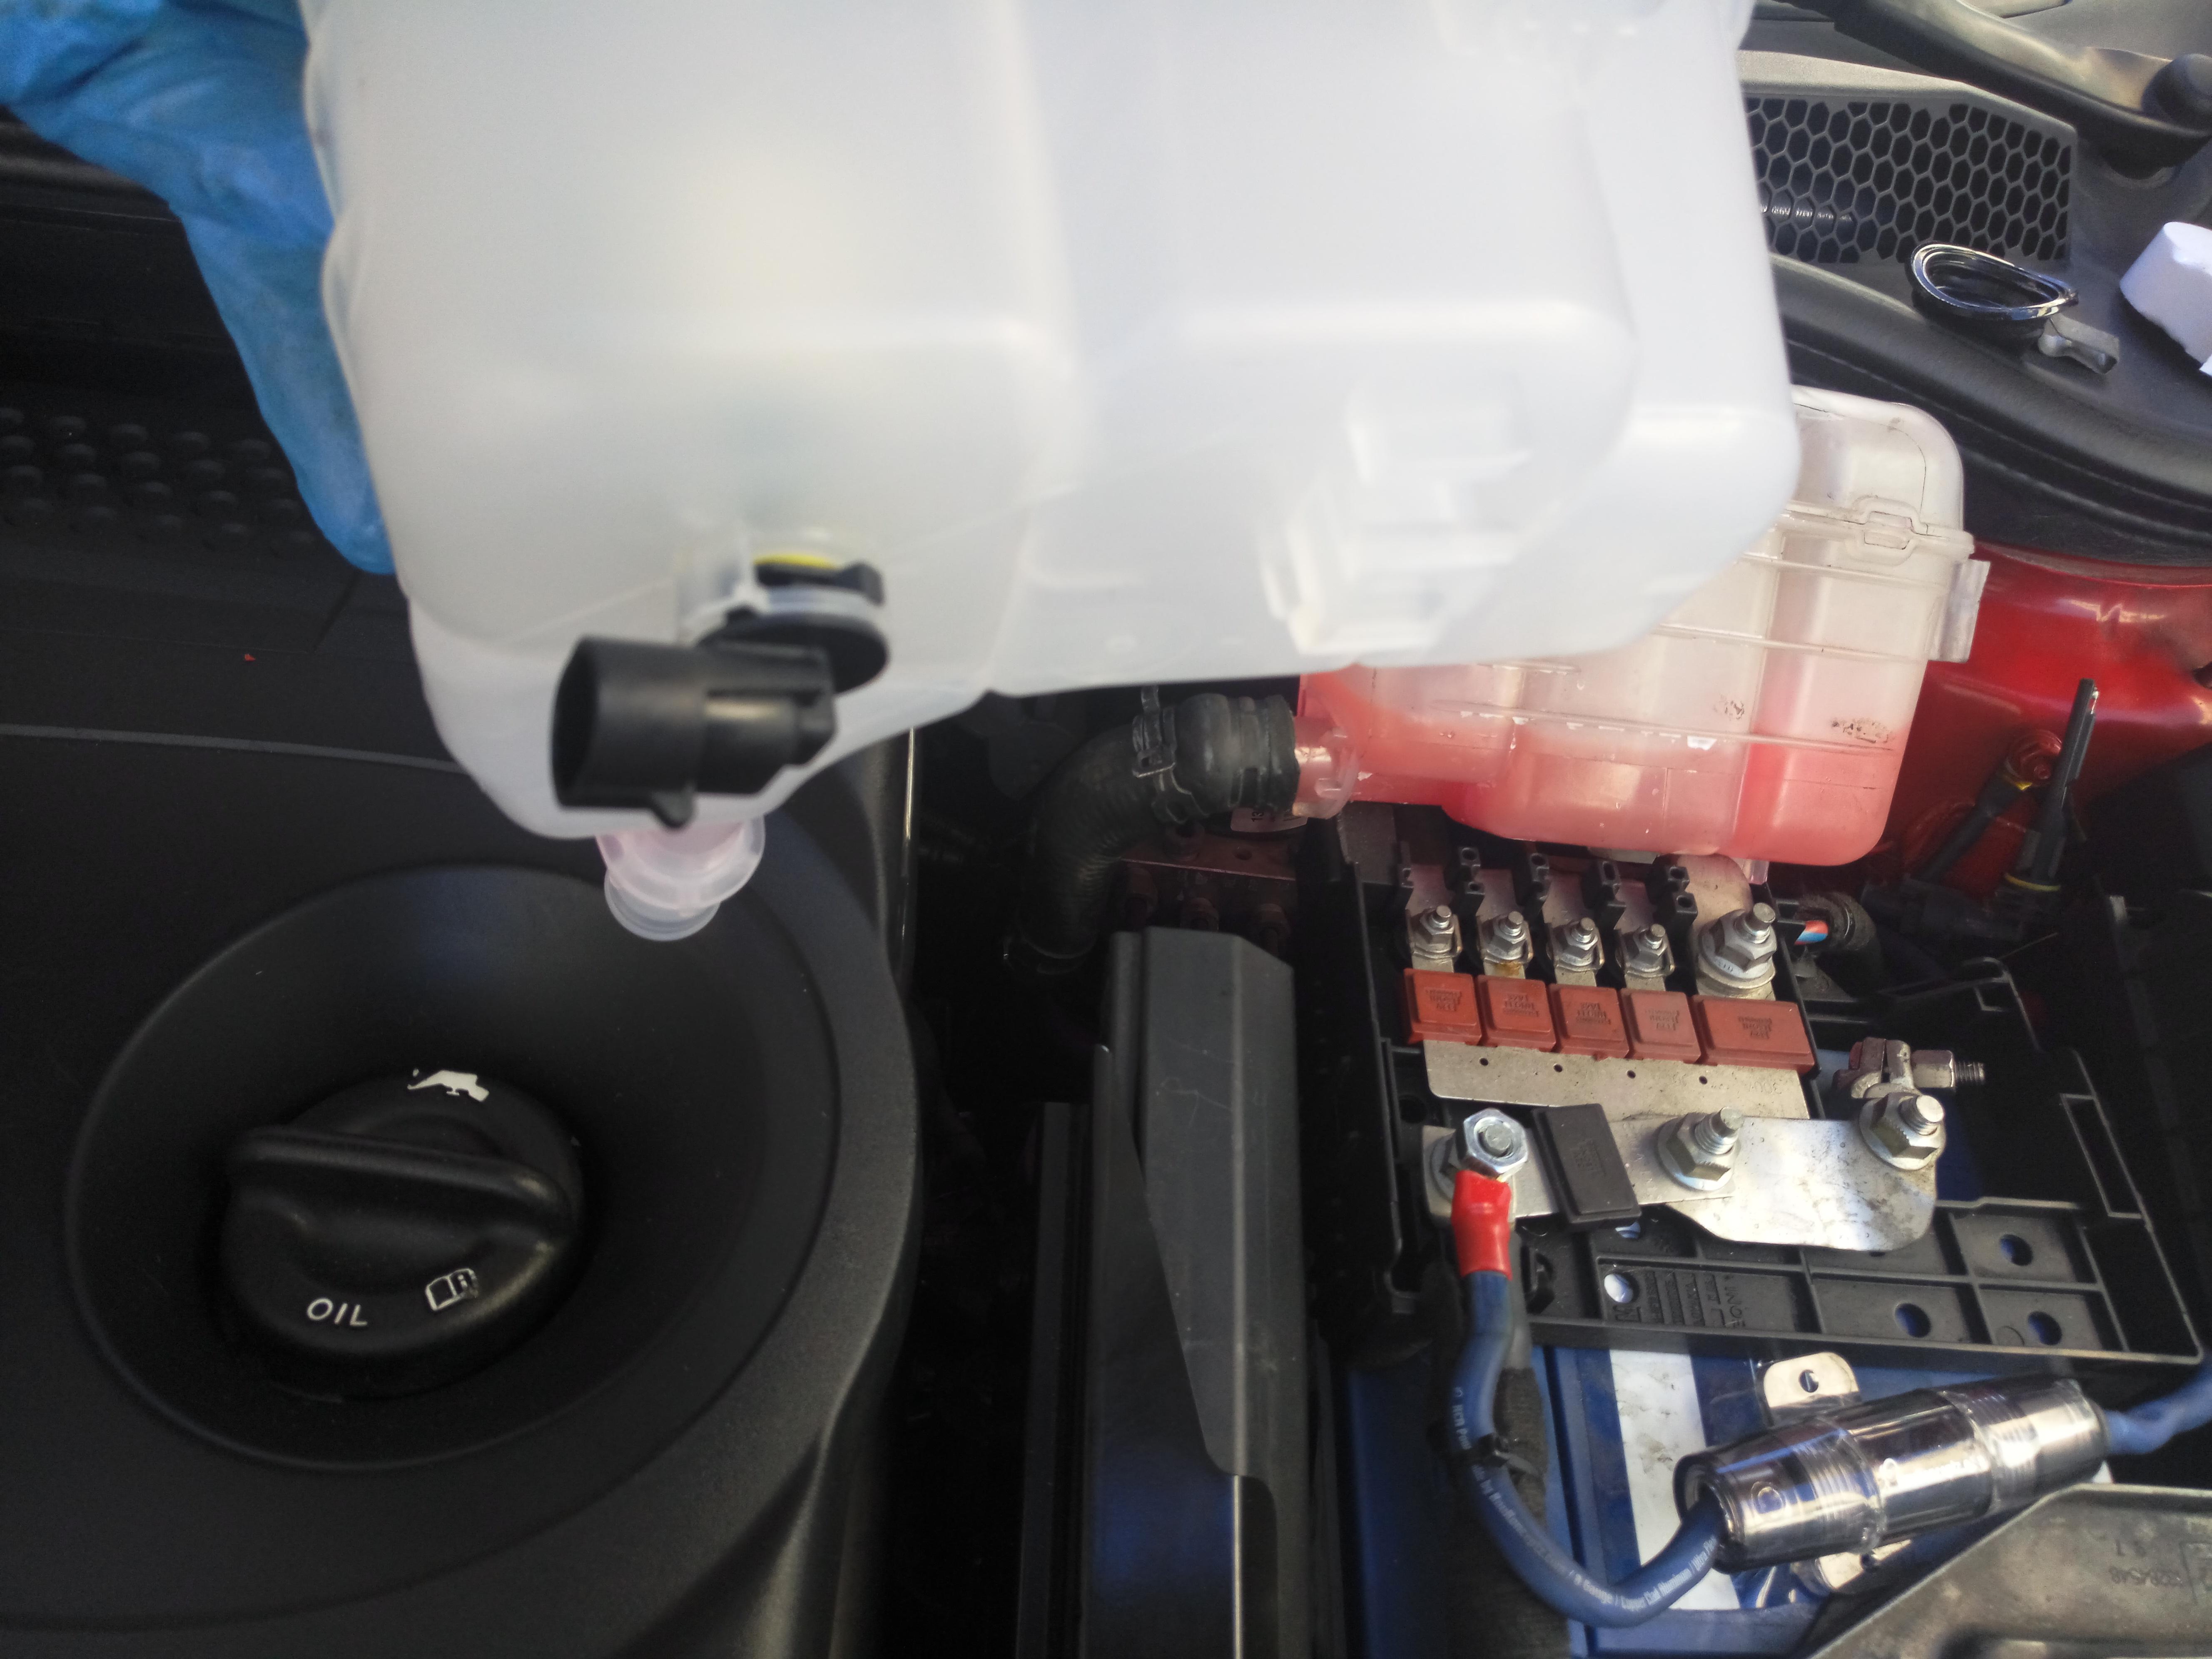 [BRICO J] Vaso de Expansion + Sonda (Astra J 2.0 CDTI) A77SPi